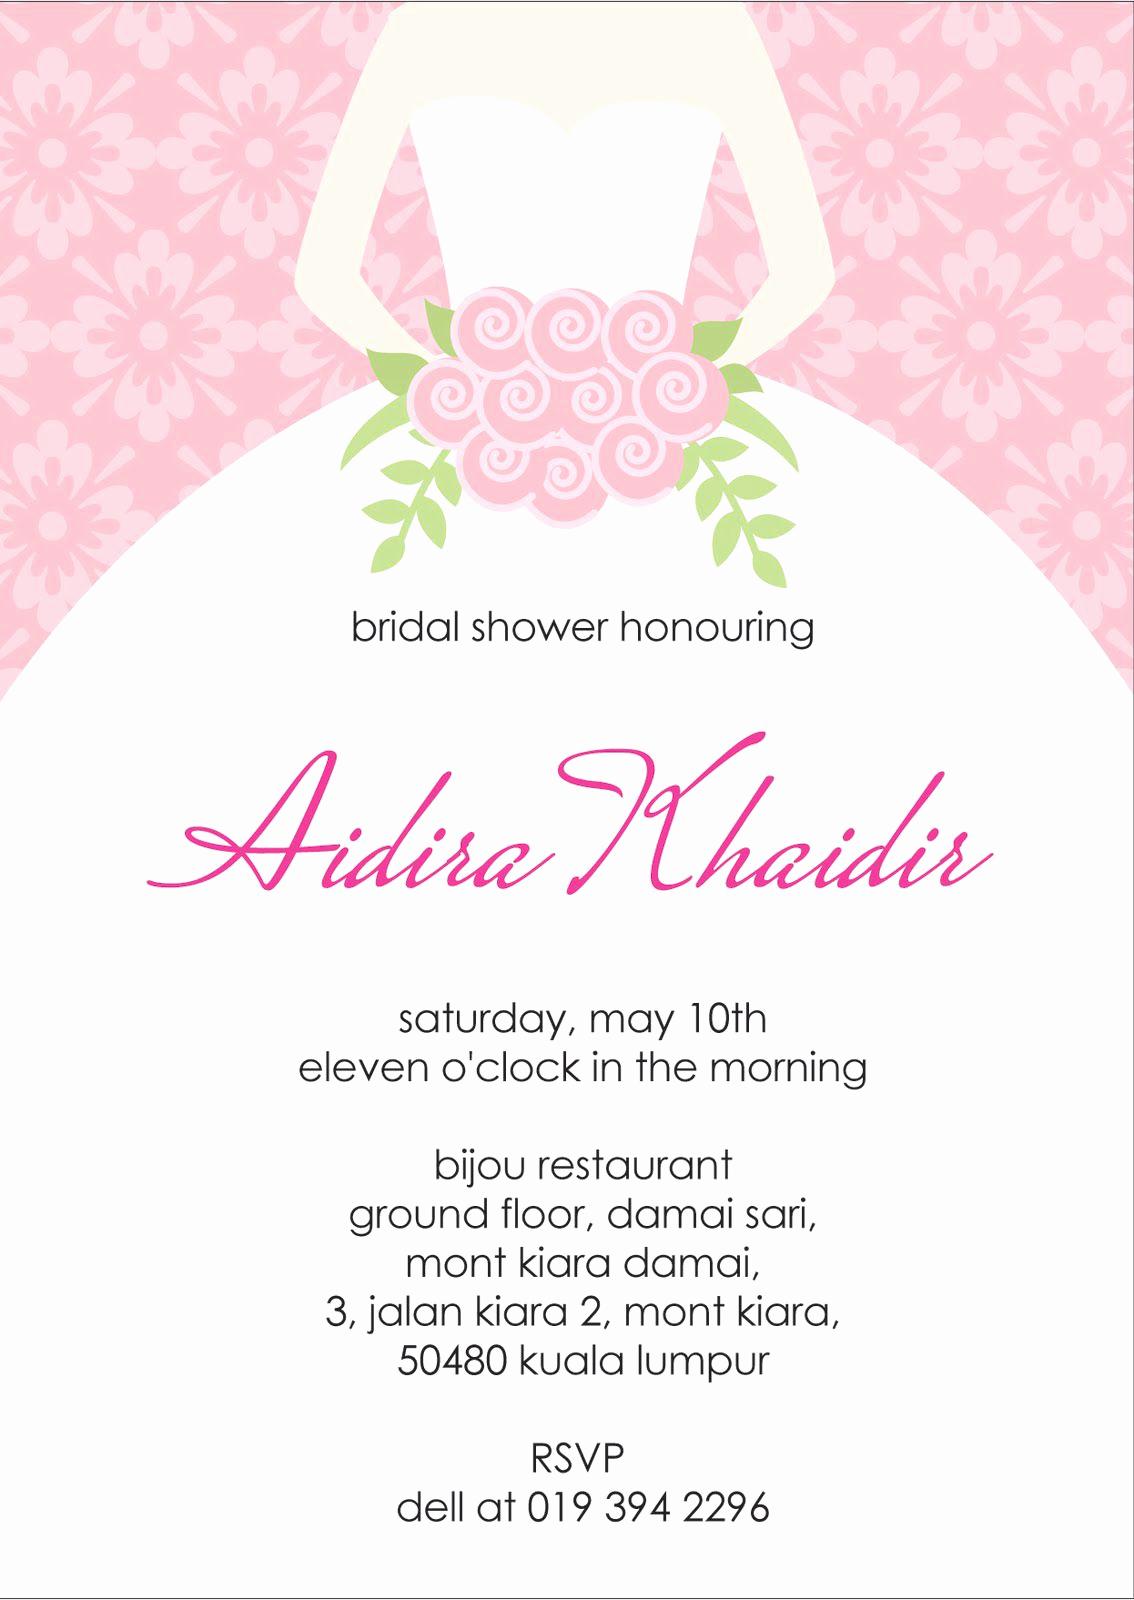 Bridal Shower Invitation Template Elegant Bridal Shower Invitation Verbiage Bridal Shower